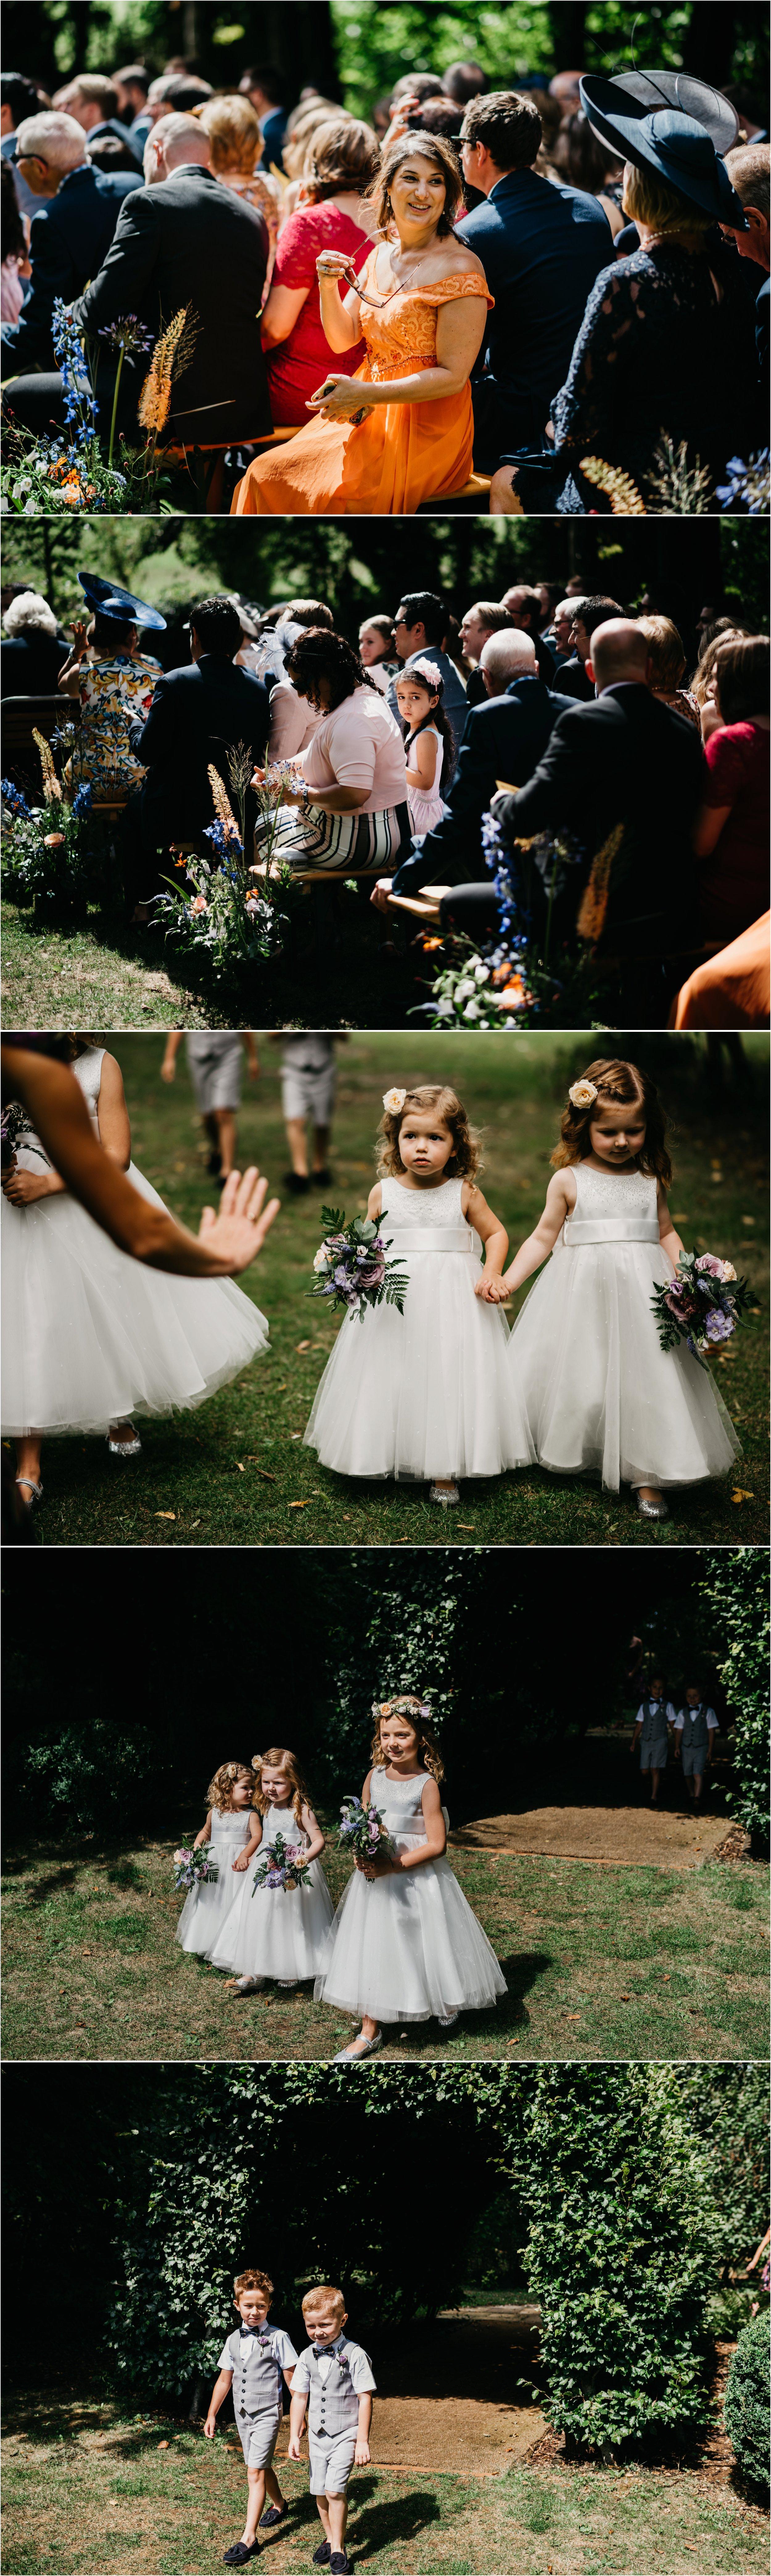 Cripps Barn wedding photography_0045.jpg